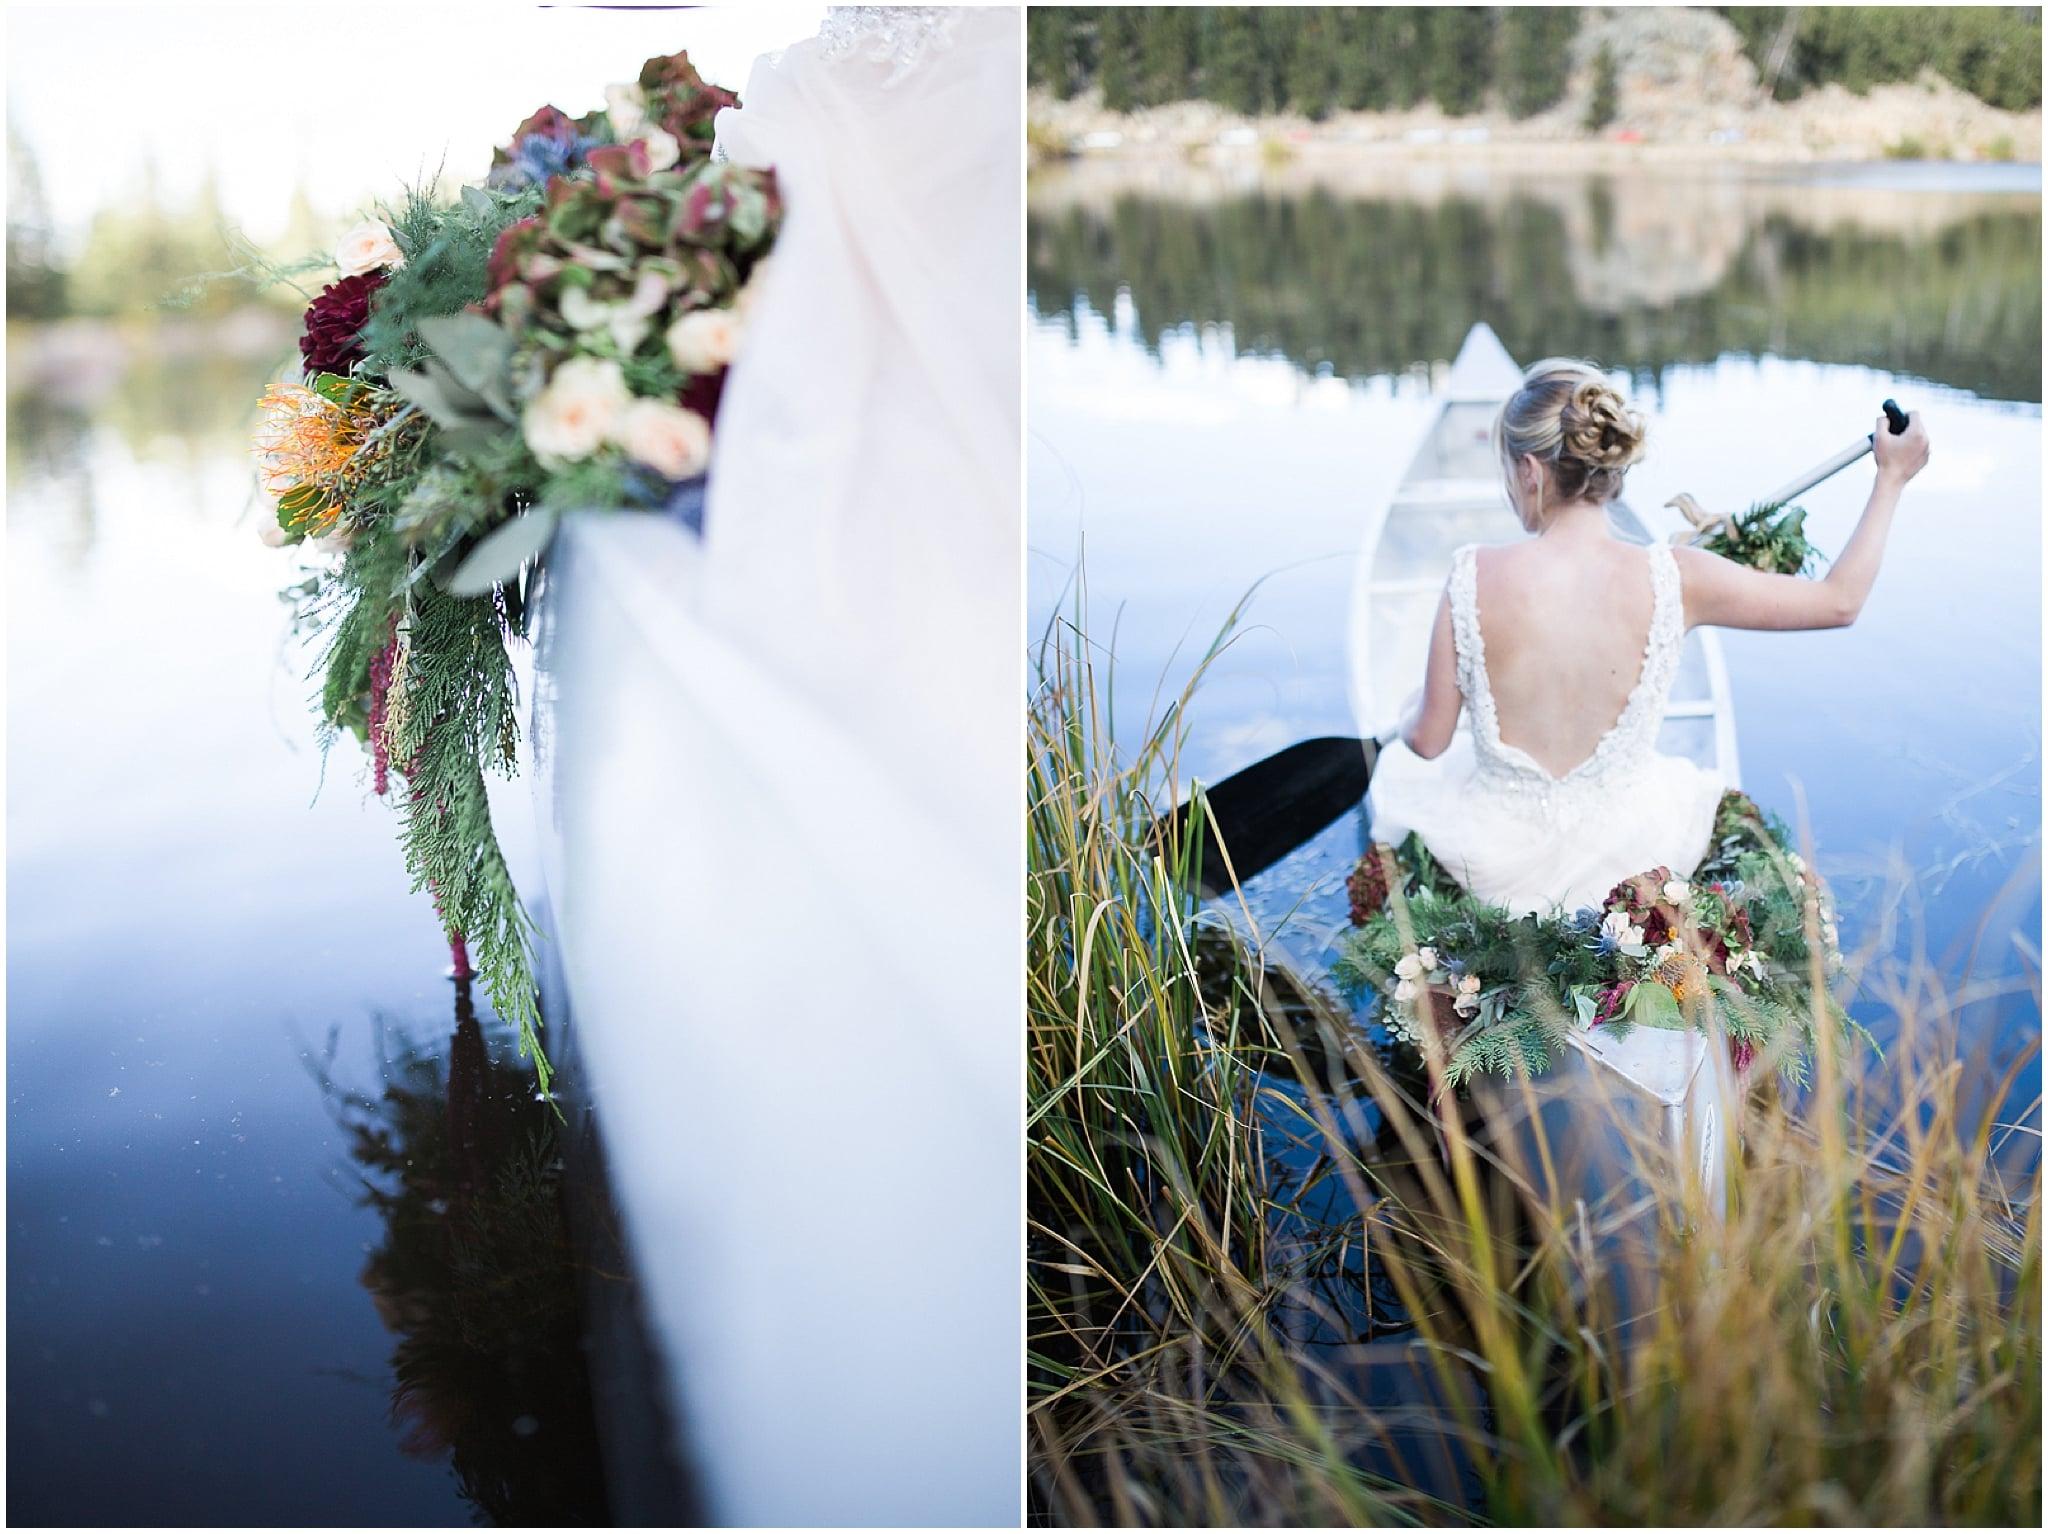 Colorado Mountain Wedding Photographer - bride rowing canoe with flowers